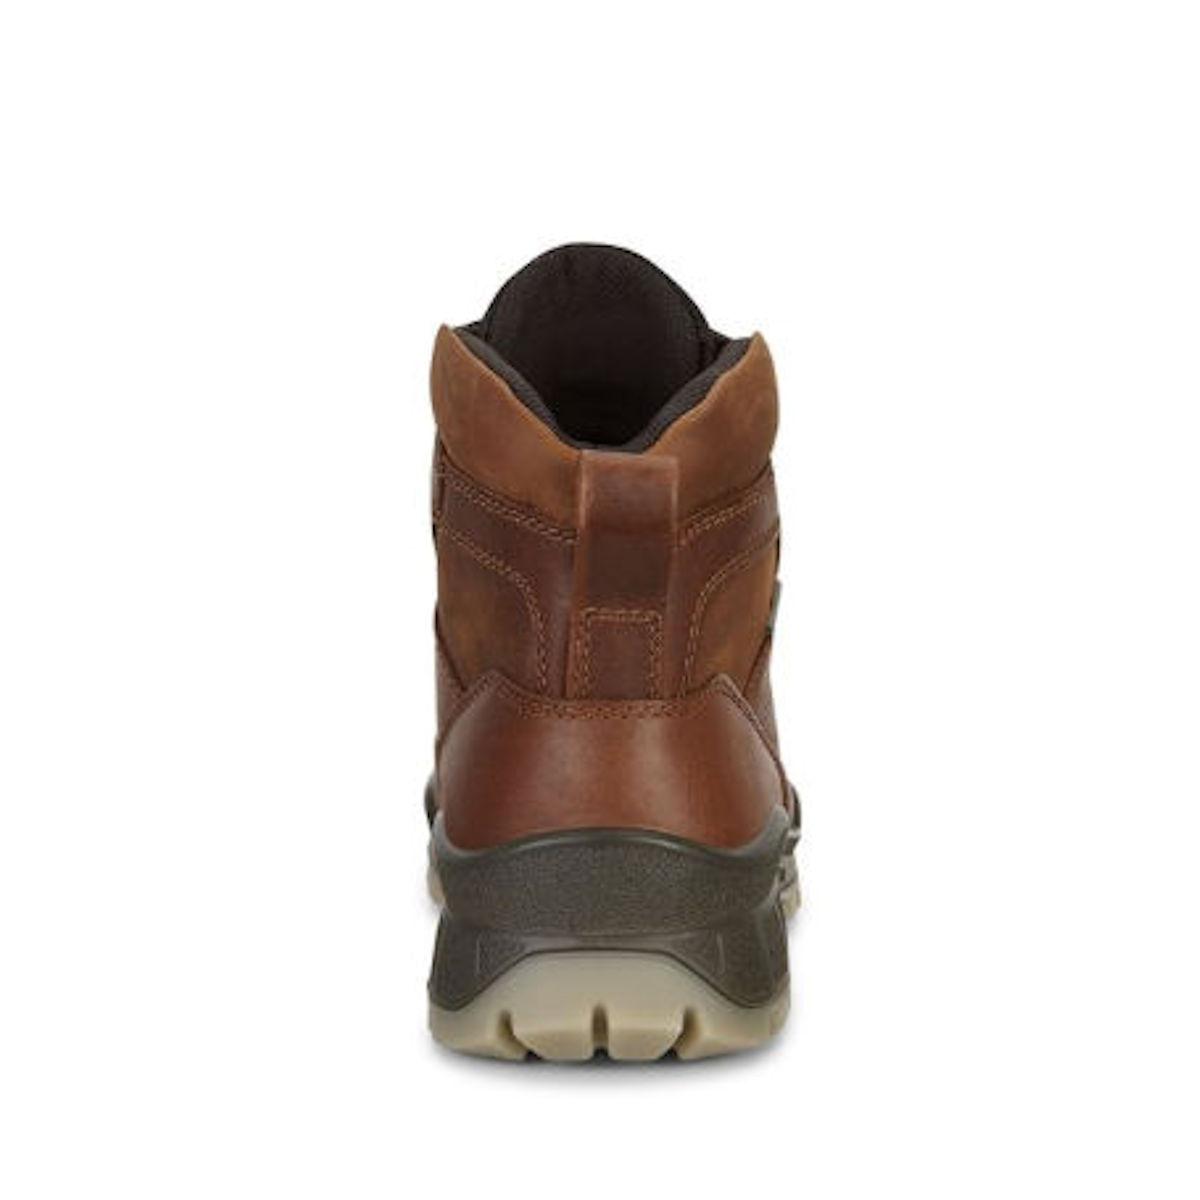 ECCO Track 25 - Mens Gor-Tex Hi Bison Hiking Boot